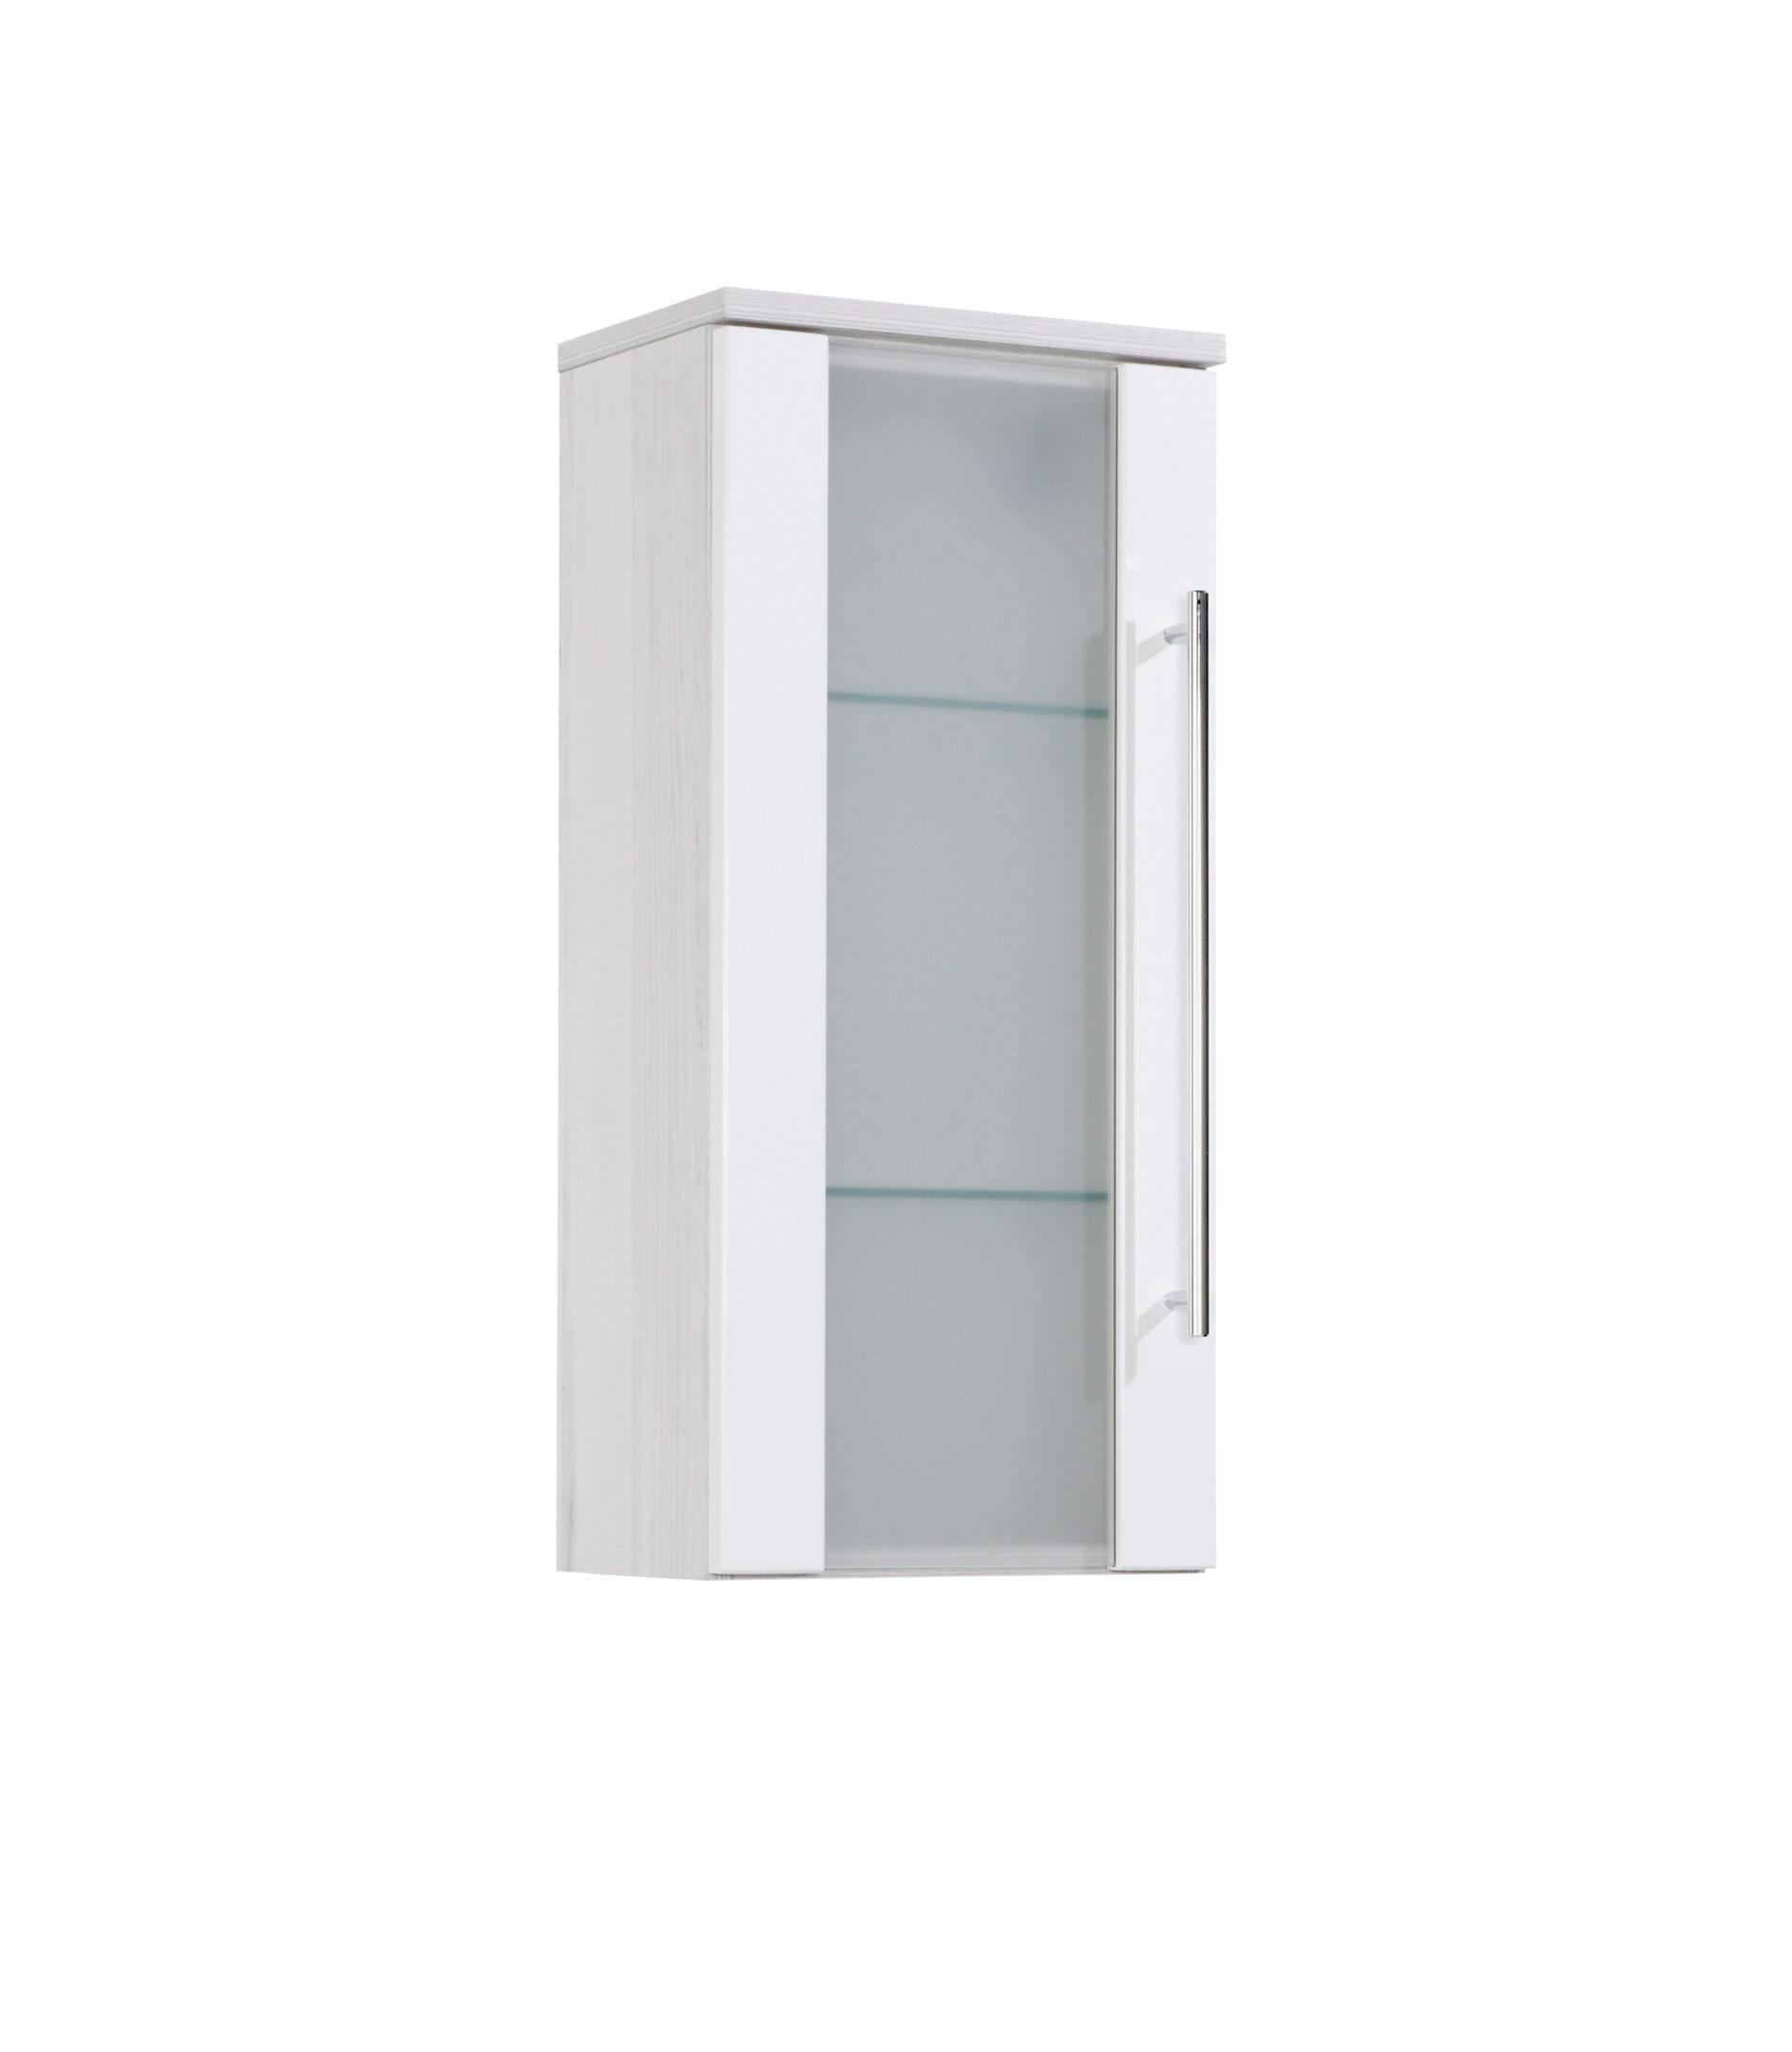 Mobel Boer Coesfeld Raume Badezimmer Spiegelschrank Bad